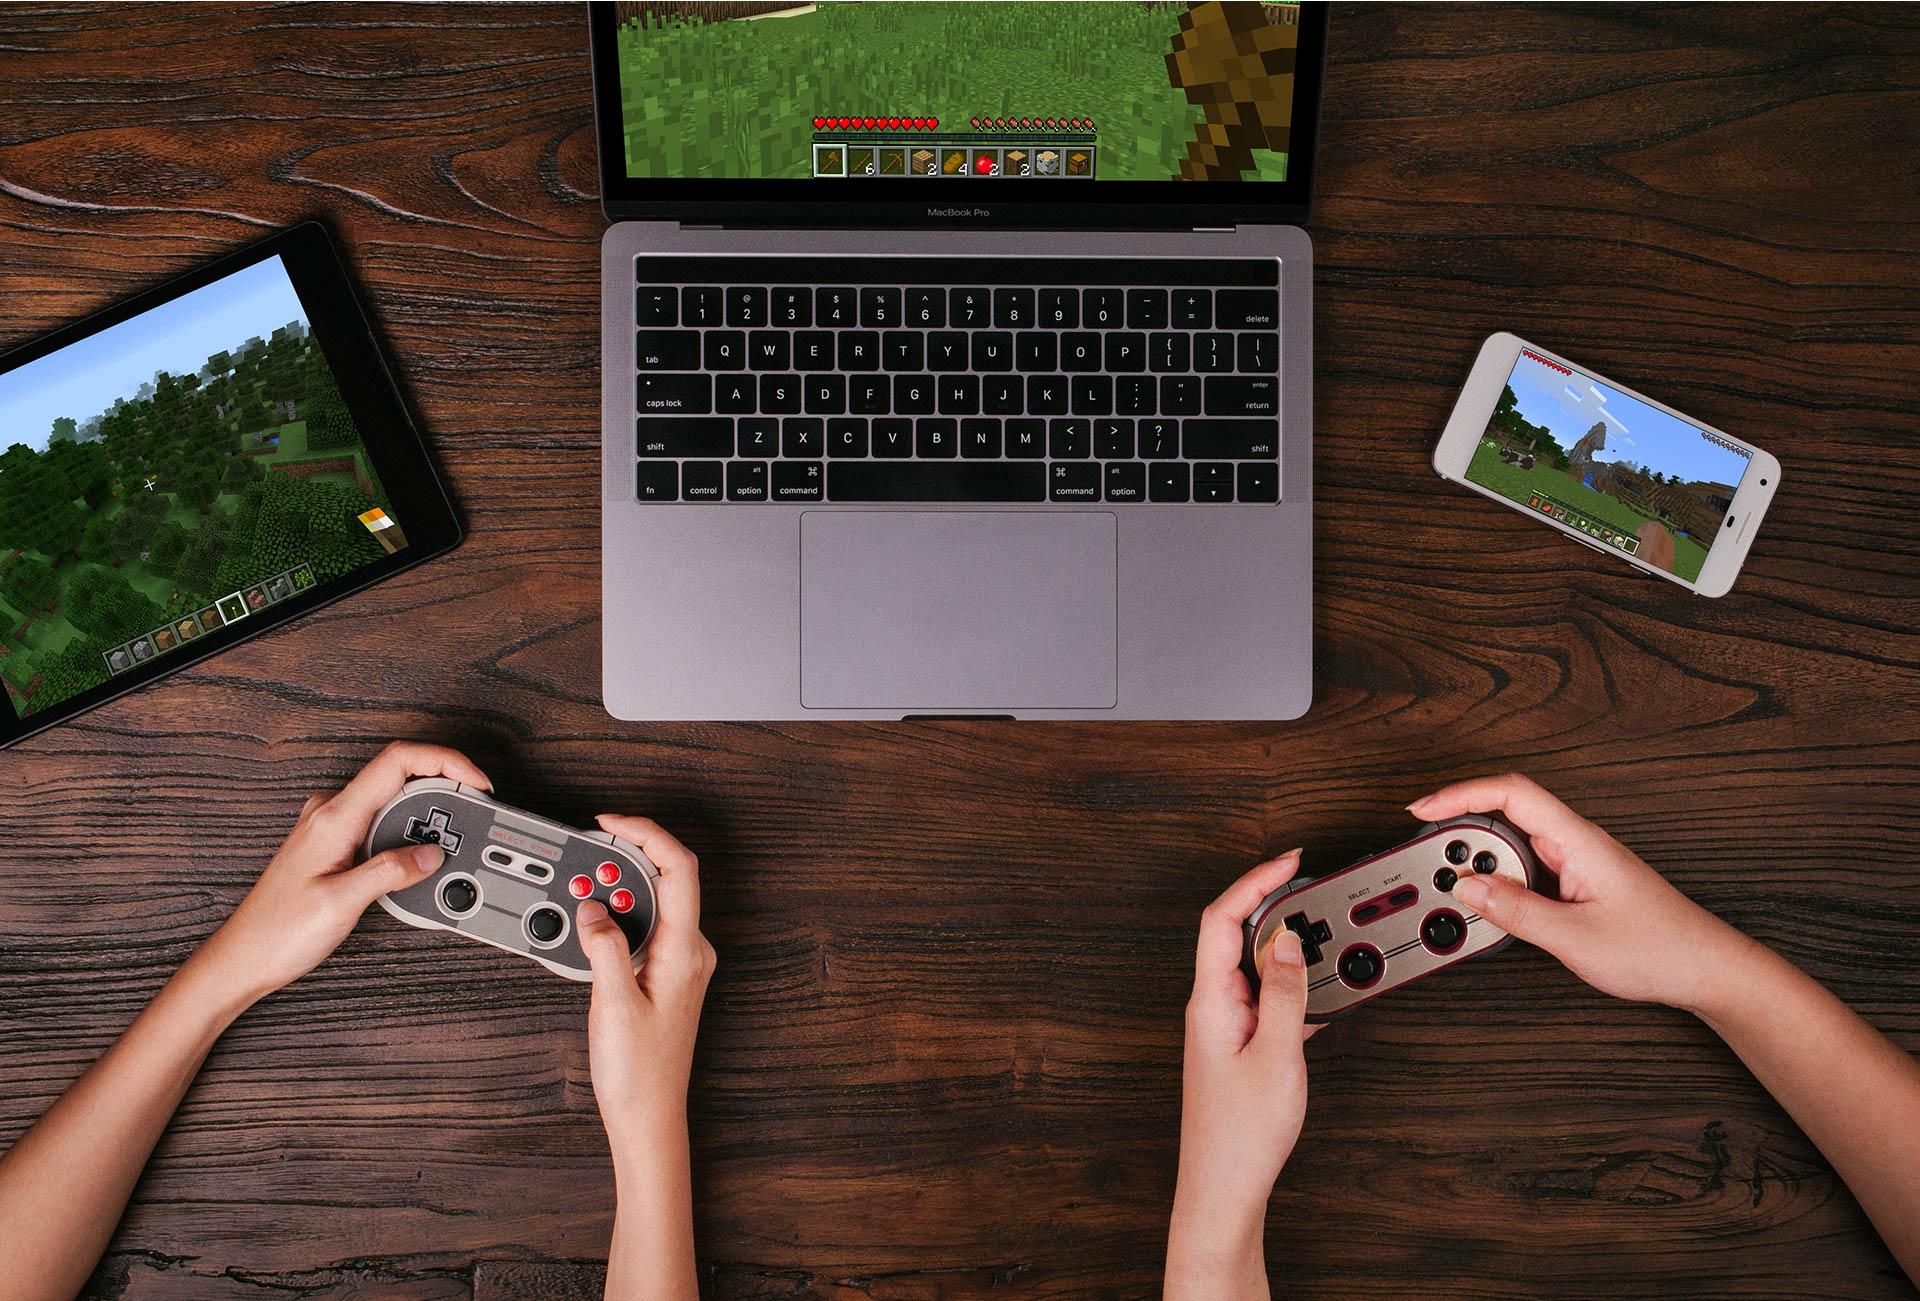 8bitdo F30 Pro Wireless Gamepad Bluetooth Controller For